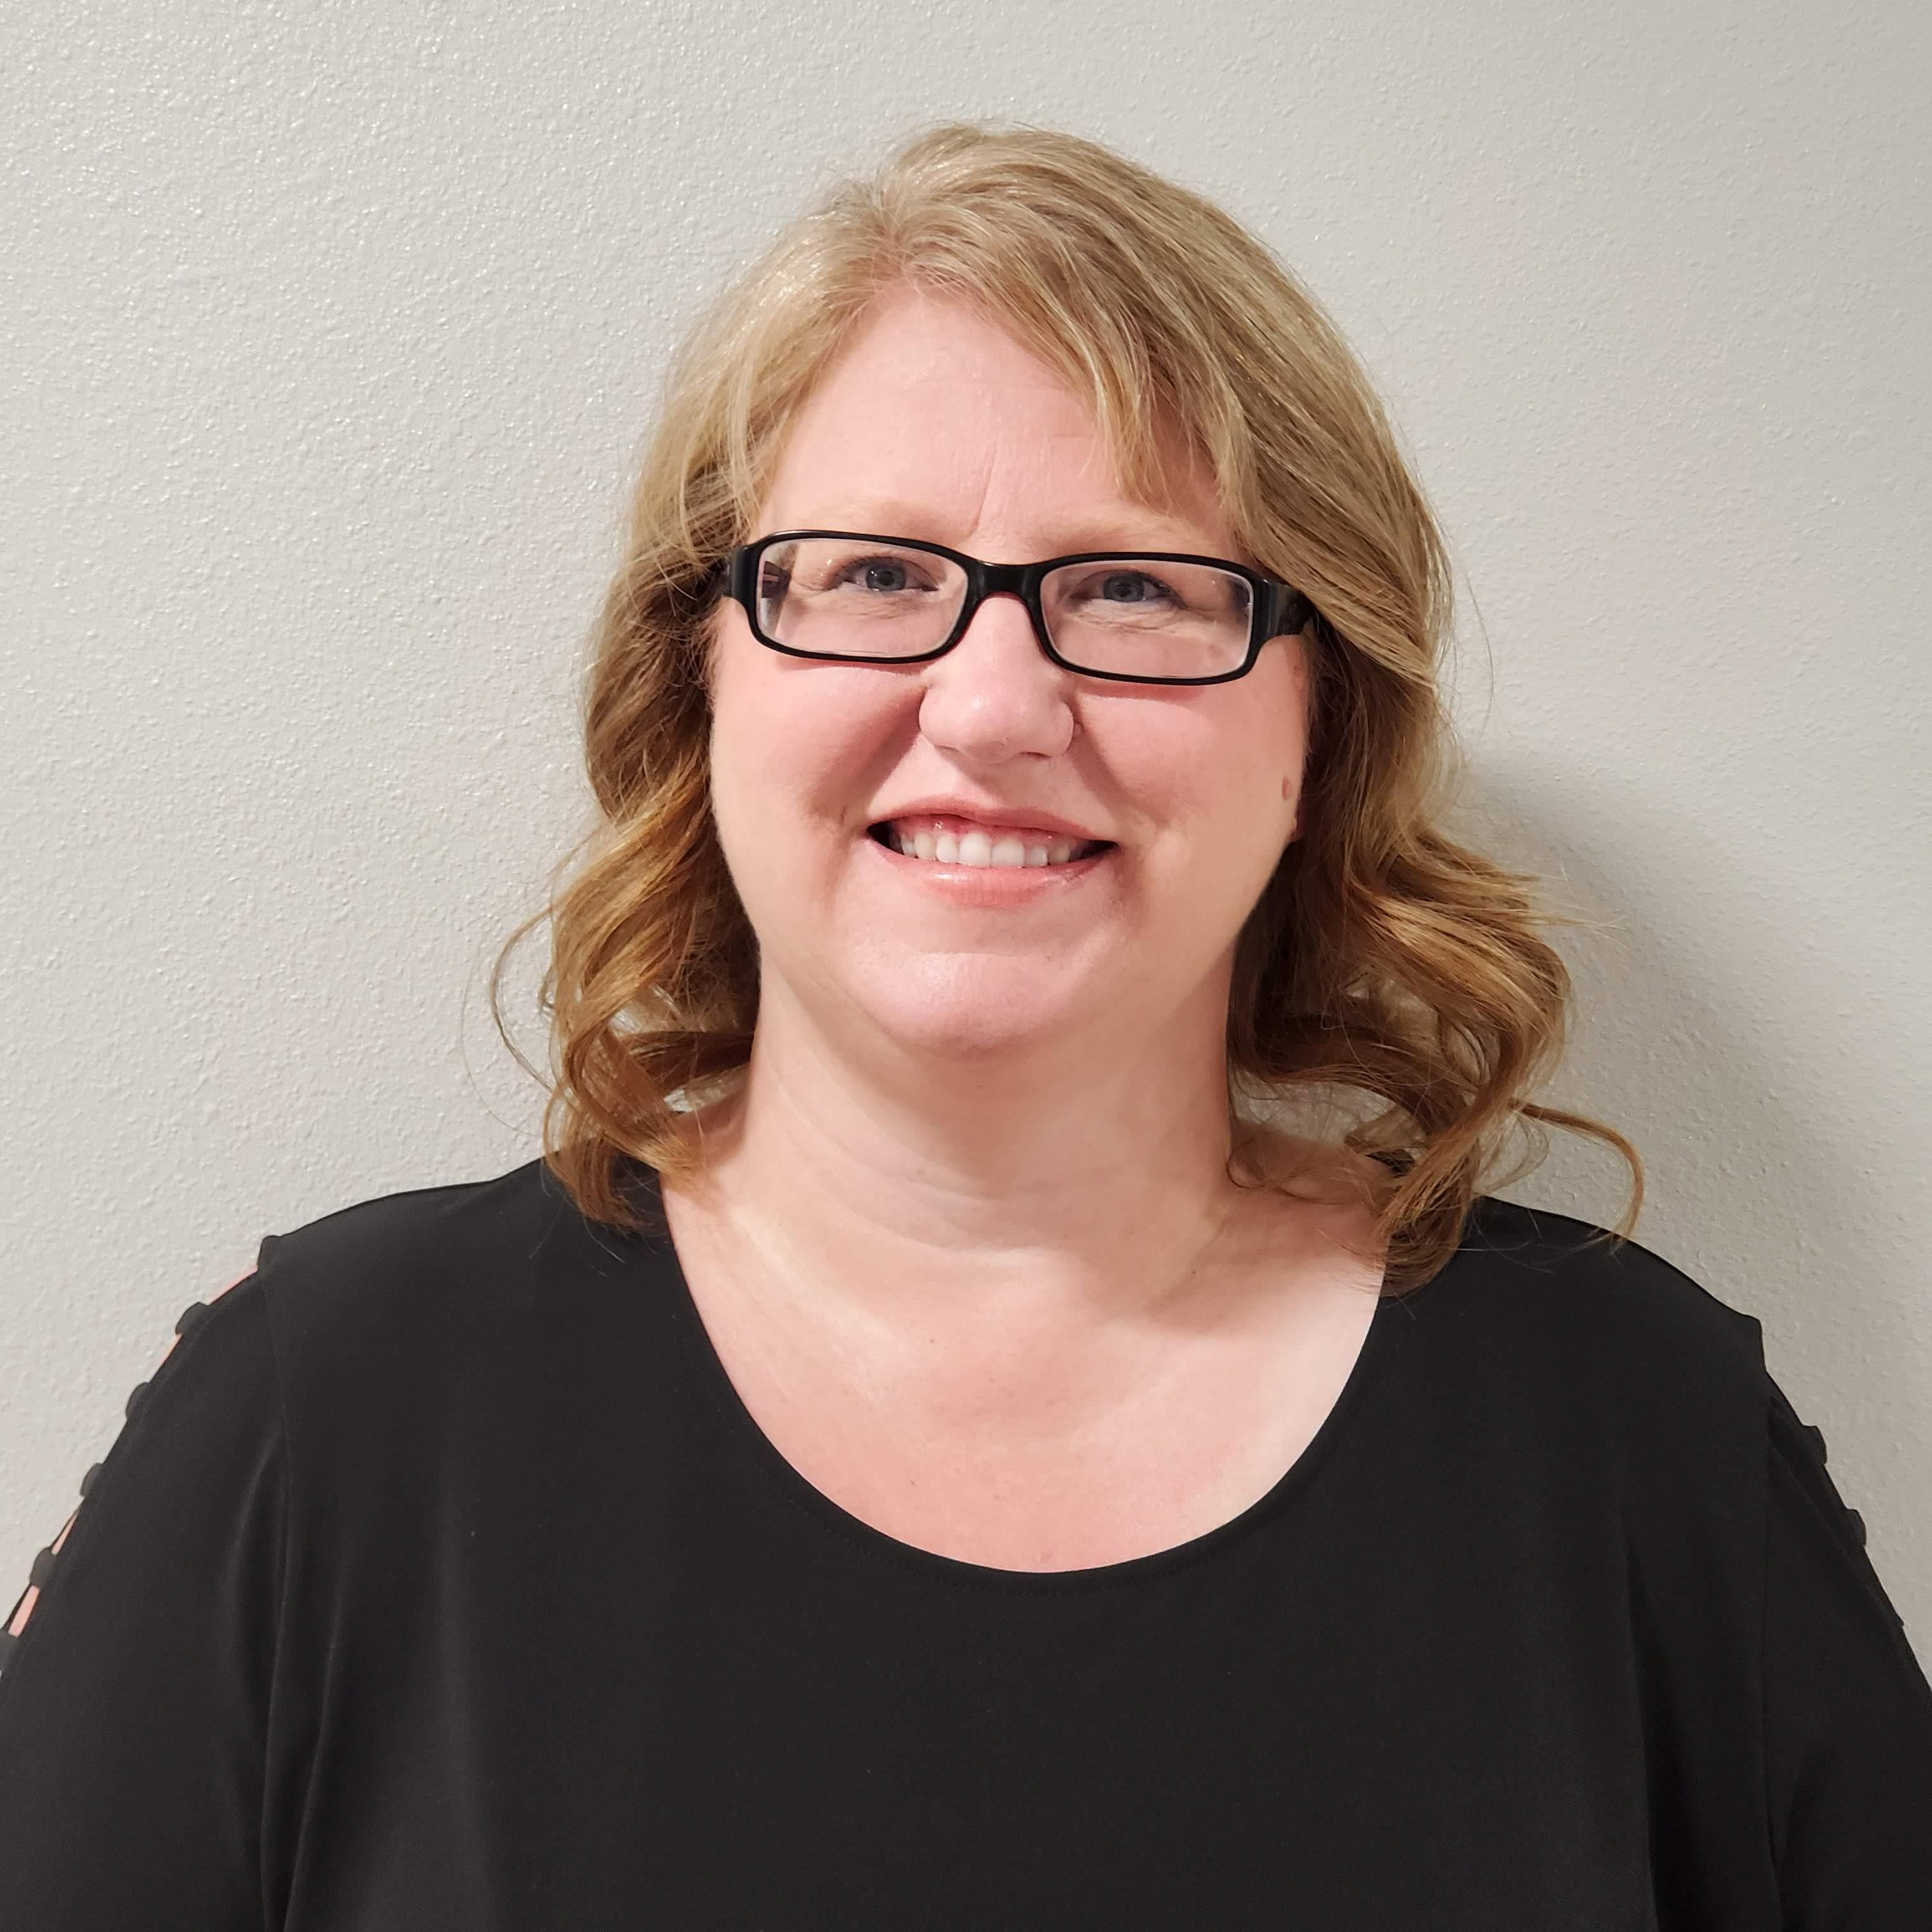 Tara Slatter's Profile Photo